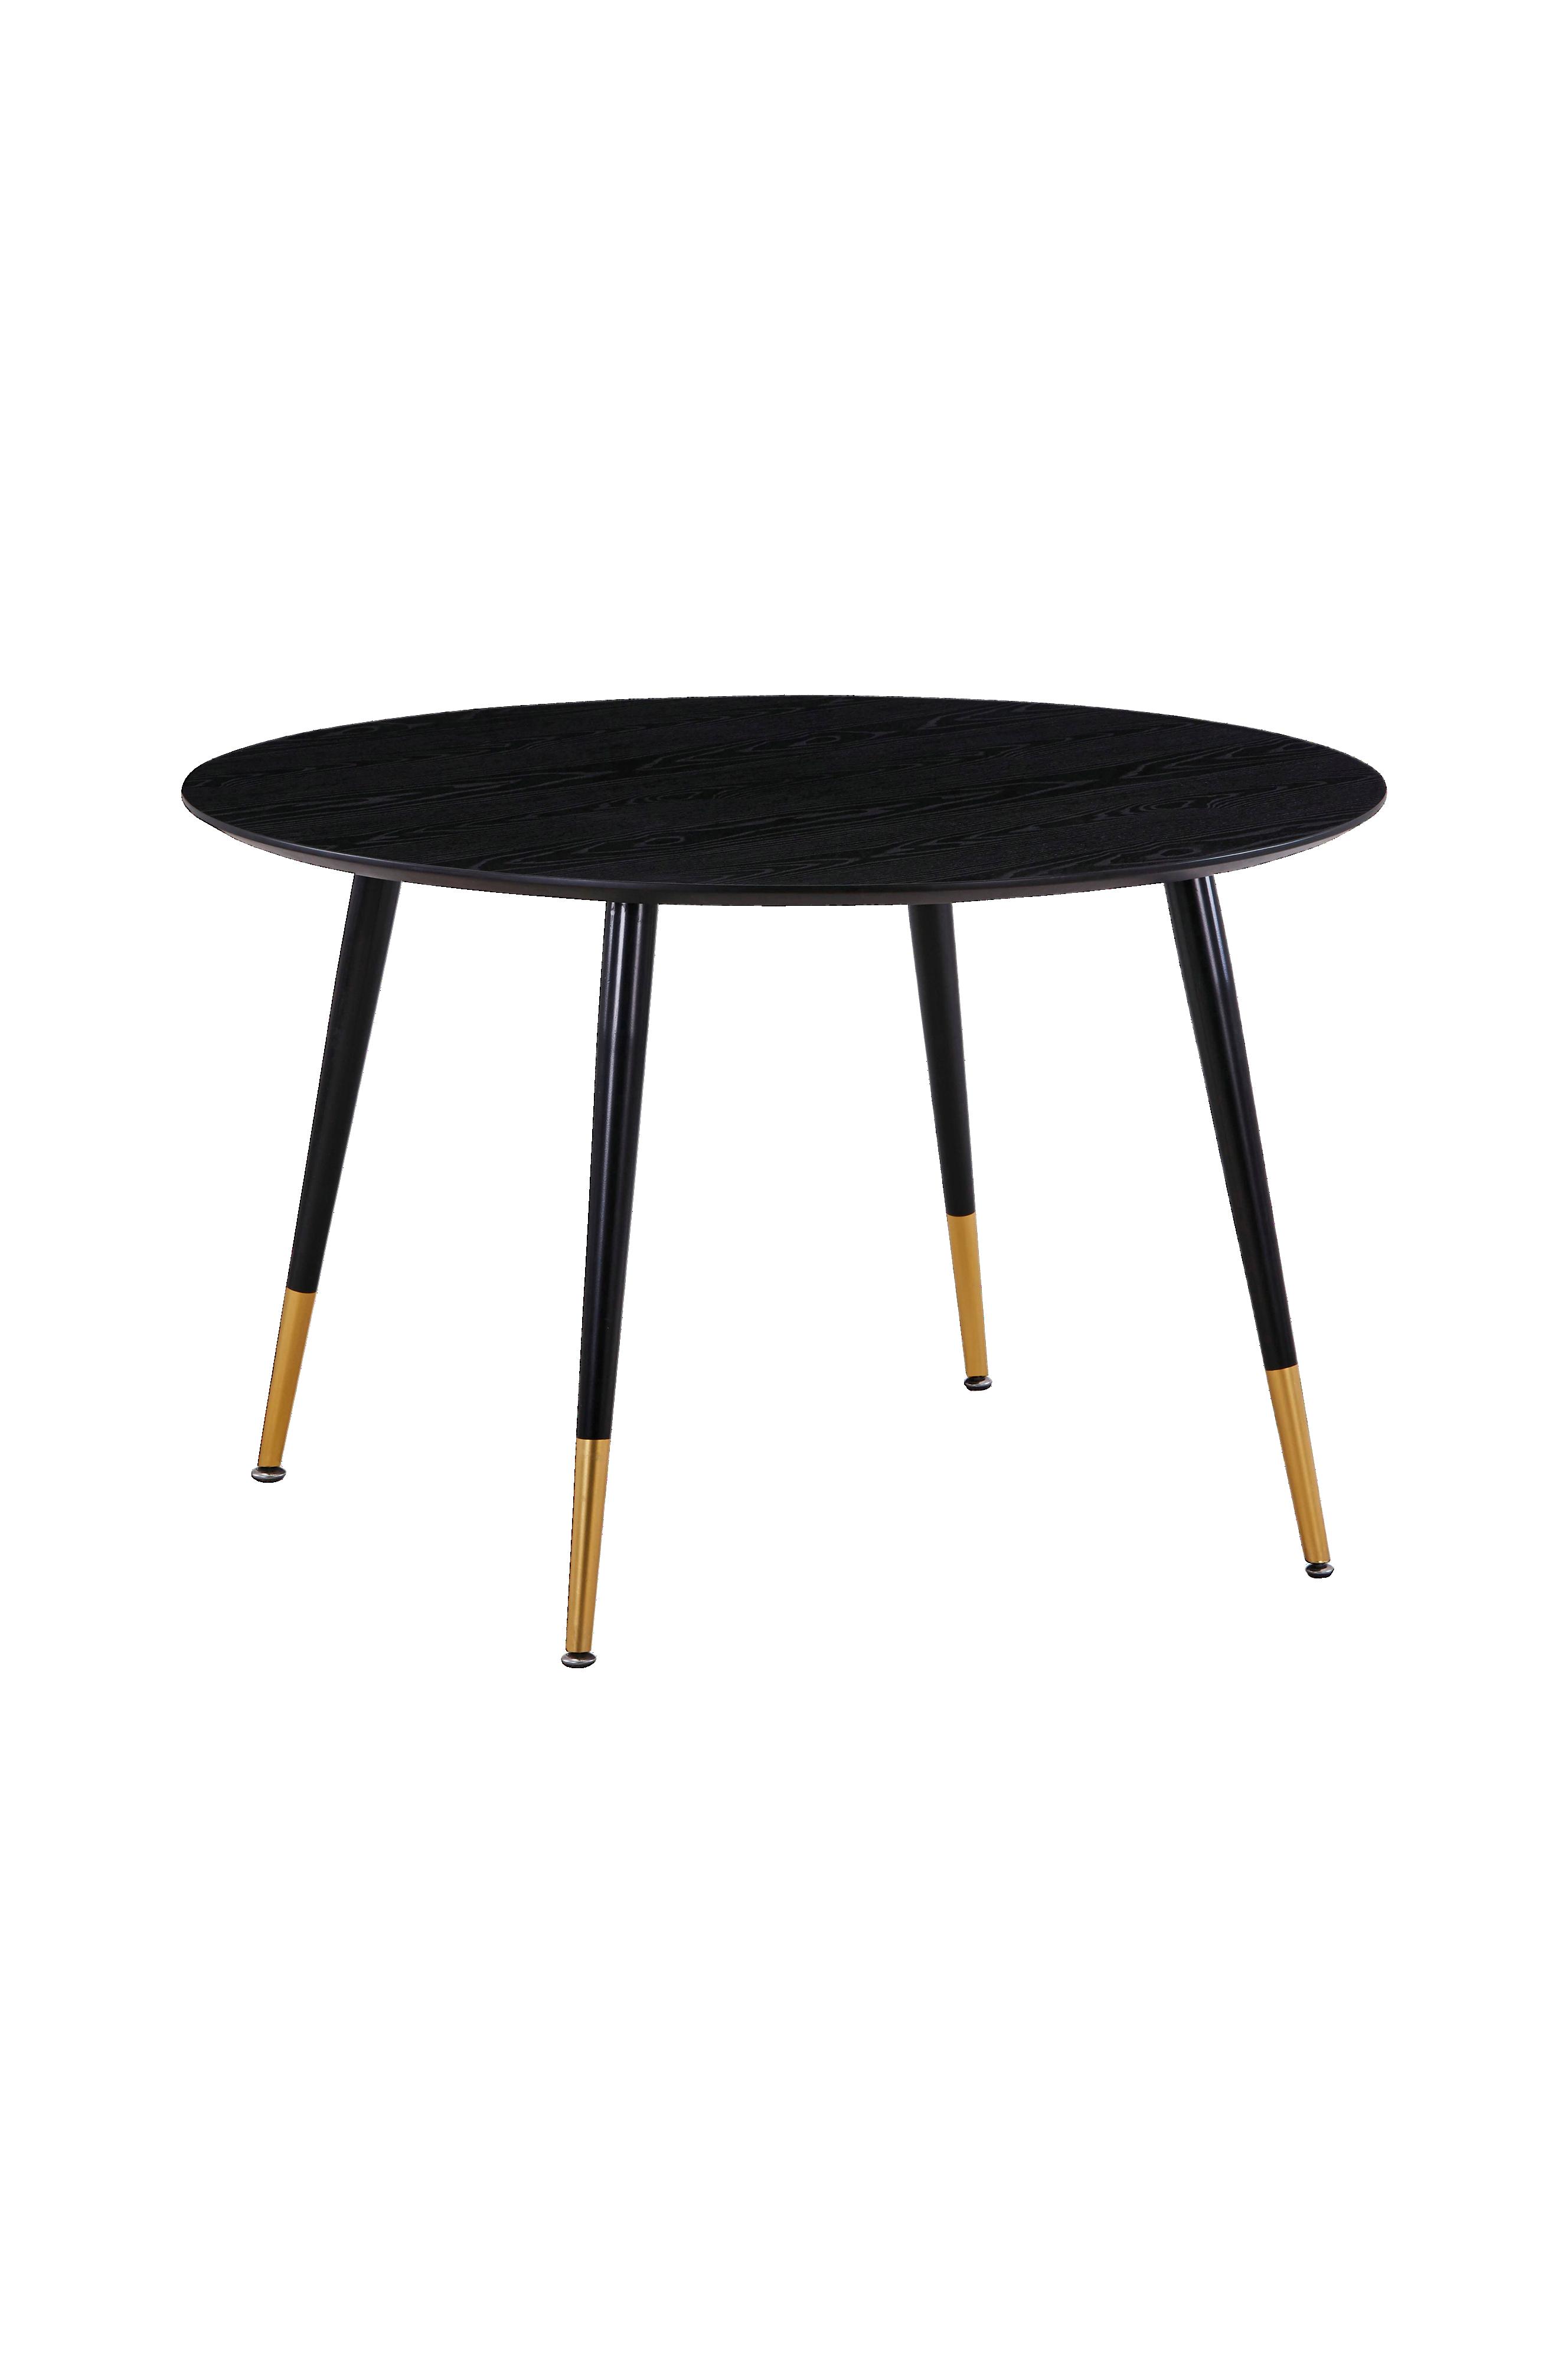 Jotex nattavaara | Rundt spisebord, Stol, Spisebord